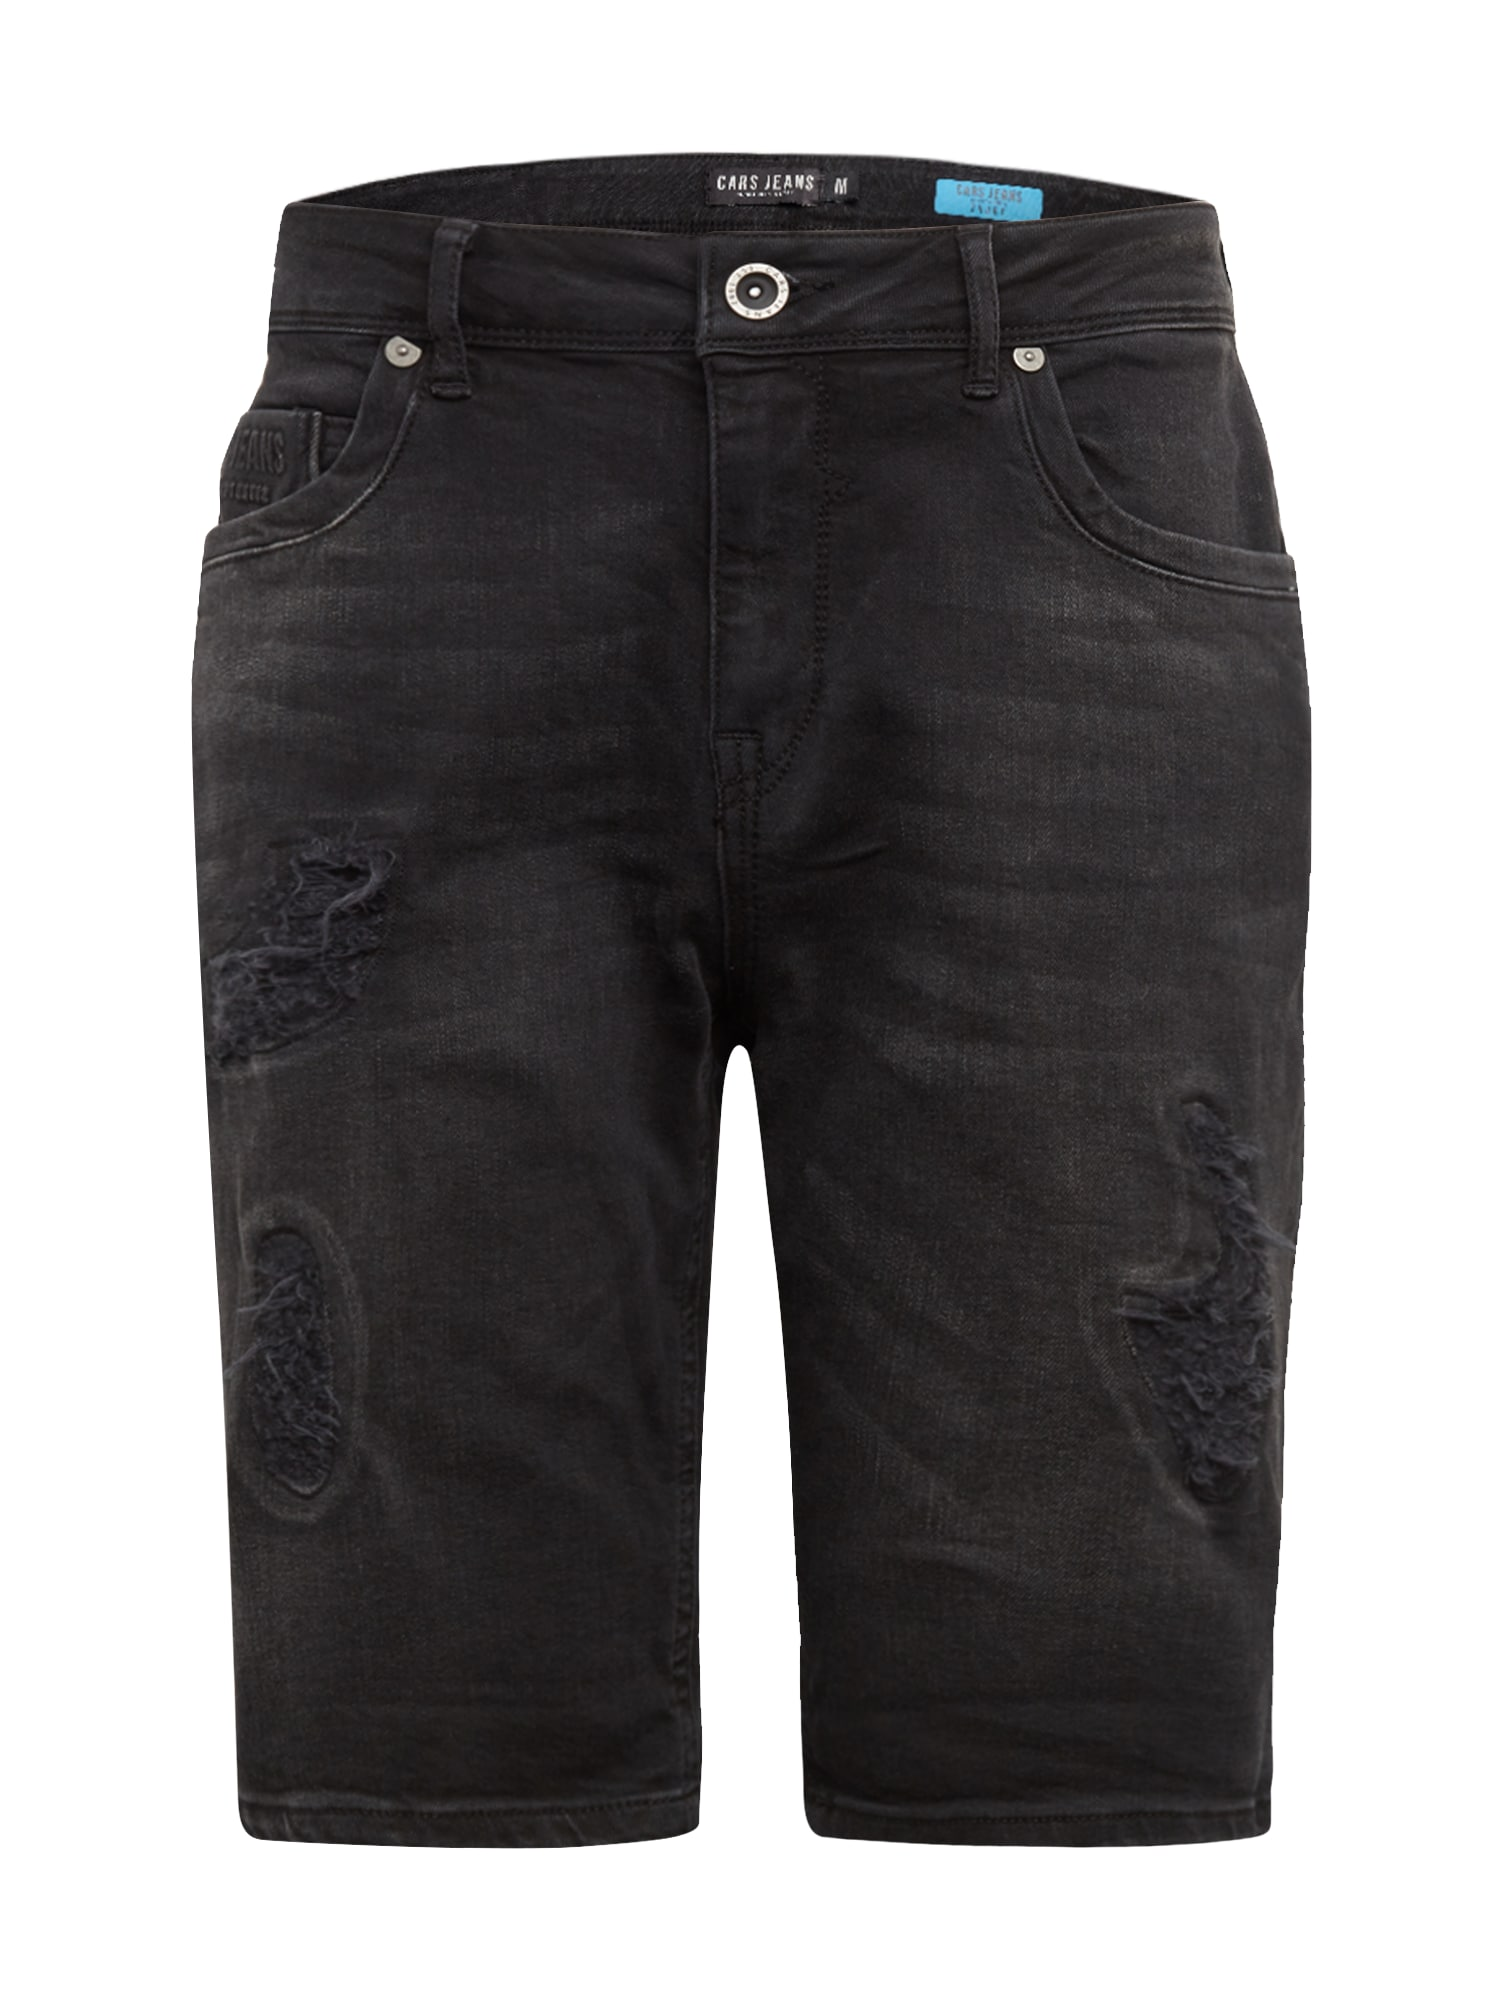 Cars Jeans Džinsai 'BECKER' juodo džinso spalva